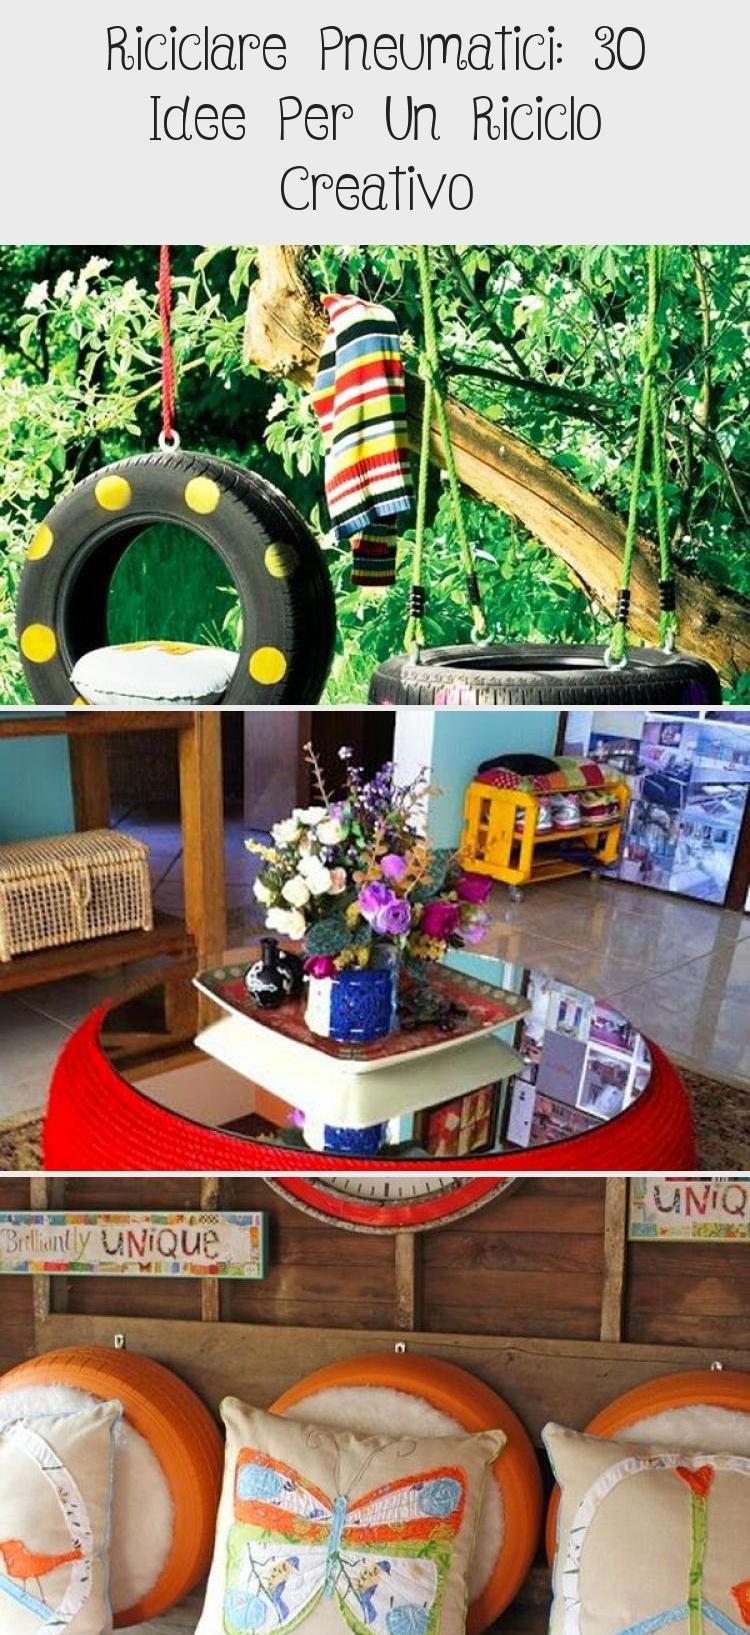 My Blog in 2020 | Diy recycle, Diy decor, Decor